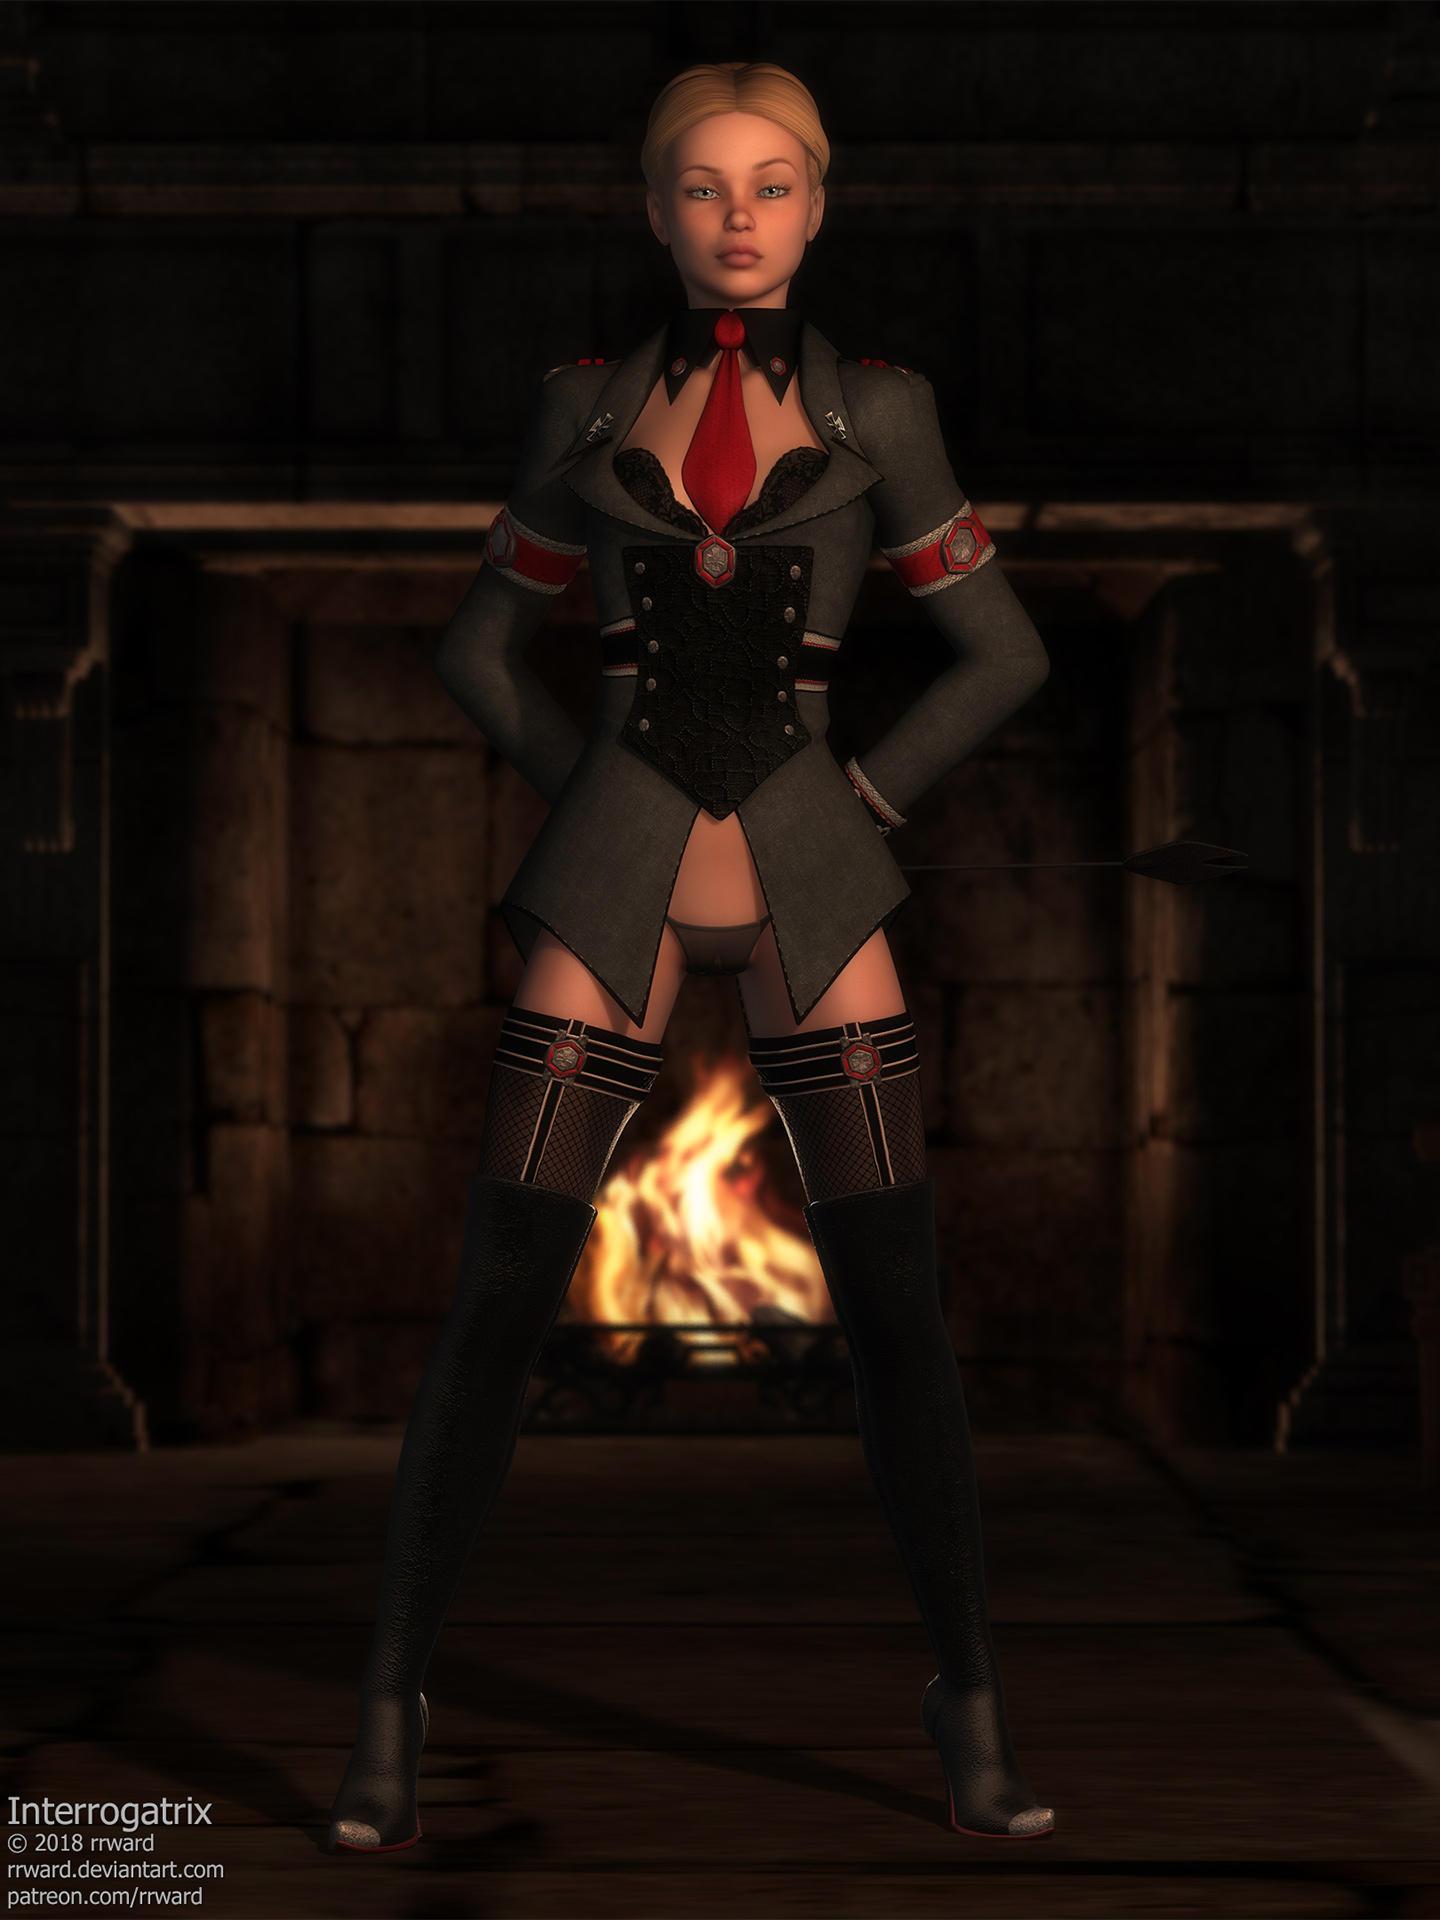 Interrogatrix 2 by rrward